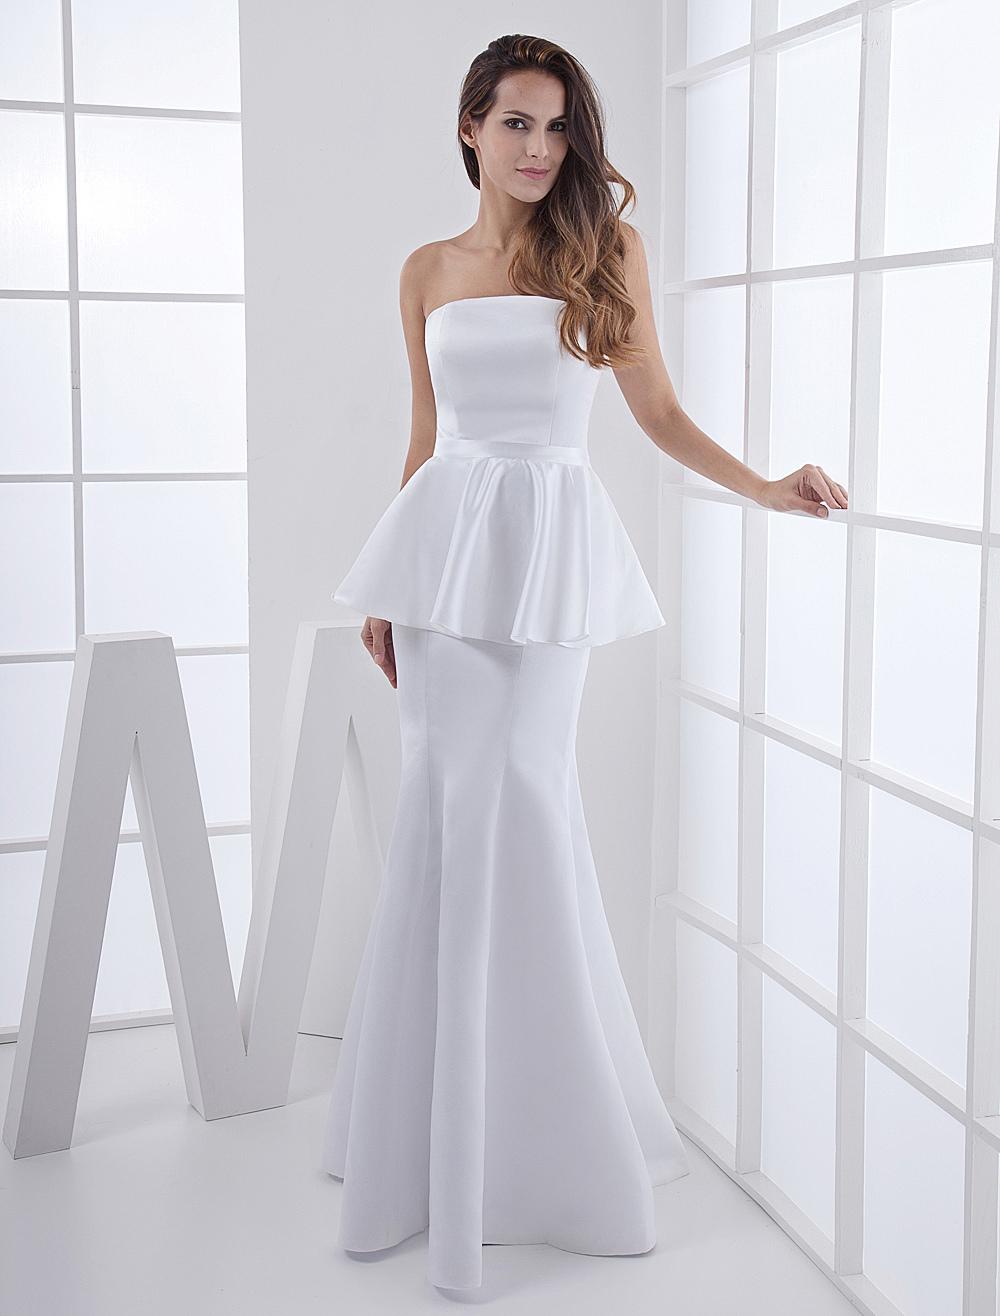 White Satin Strapless Evening Dress (Wedding Evening Dresses) photo